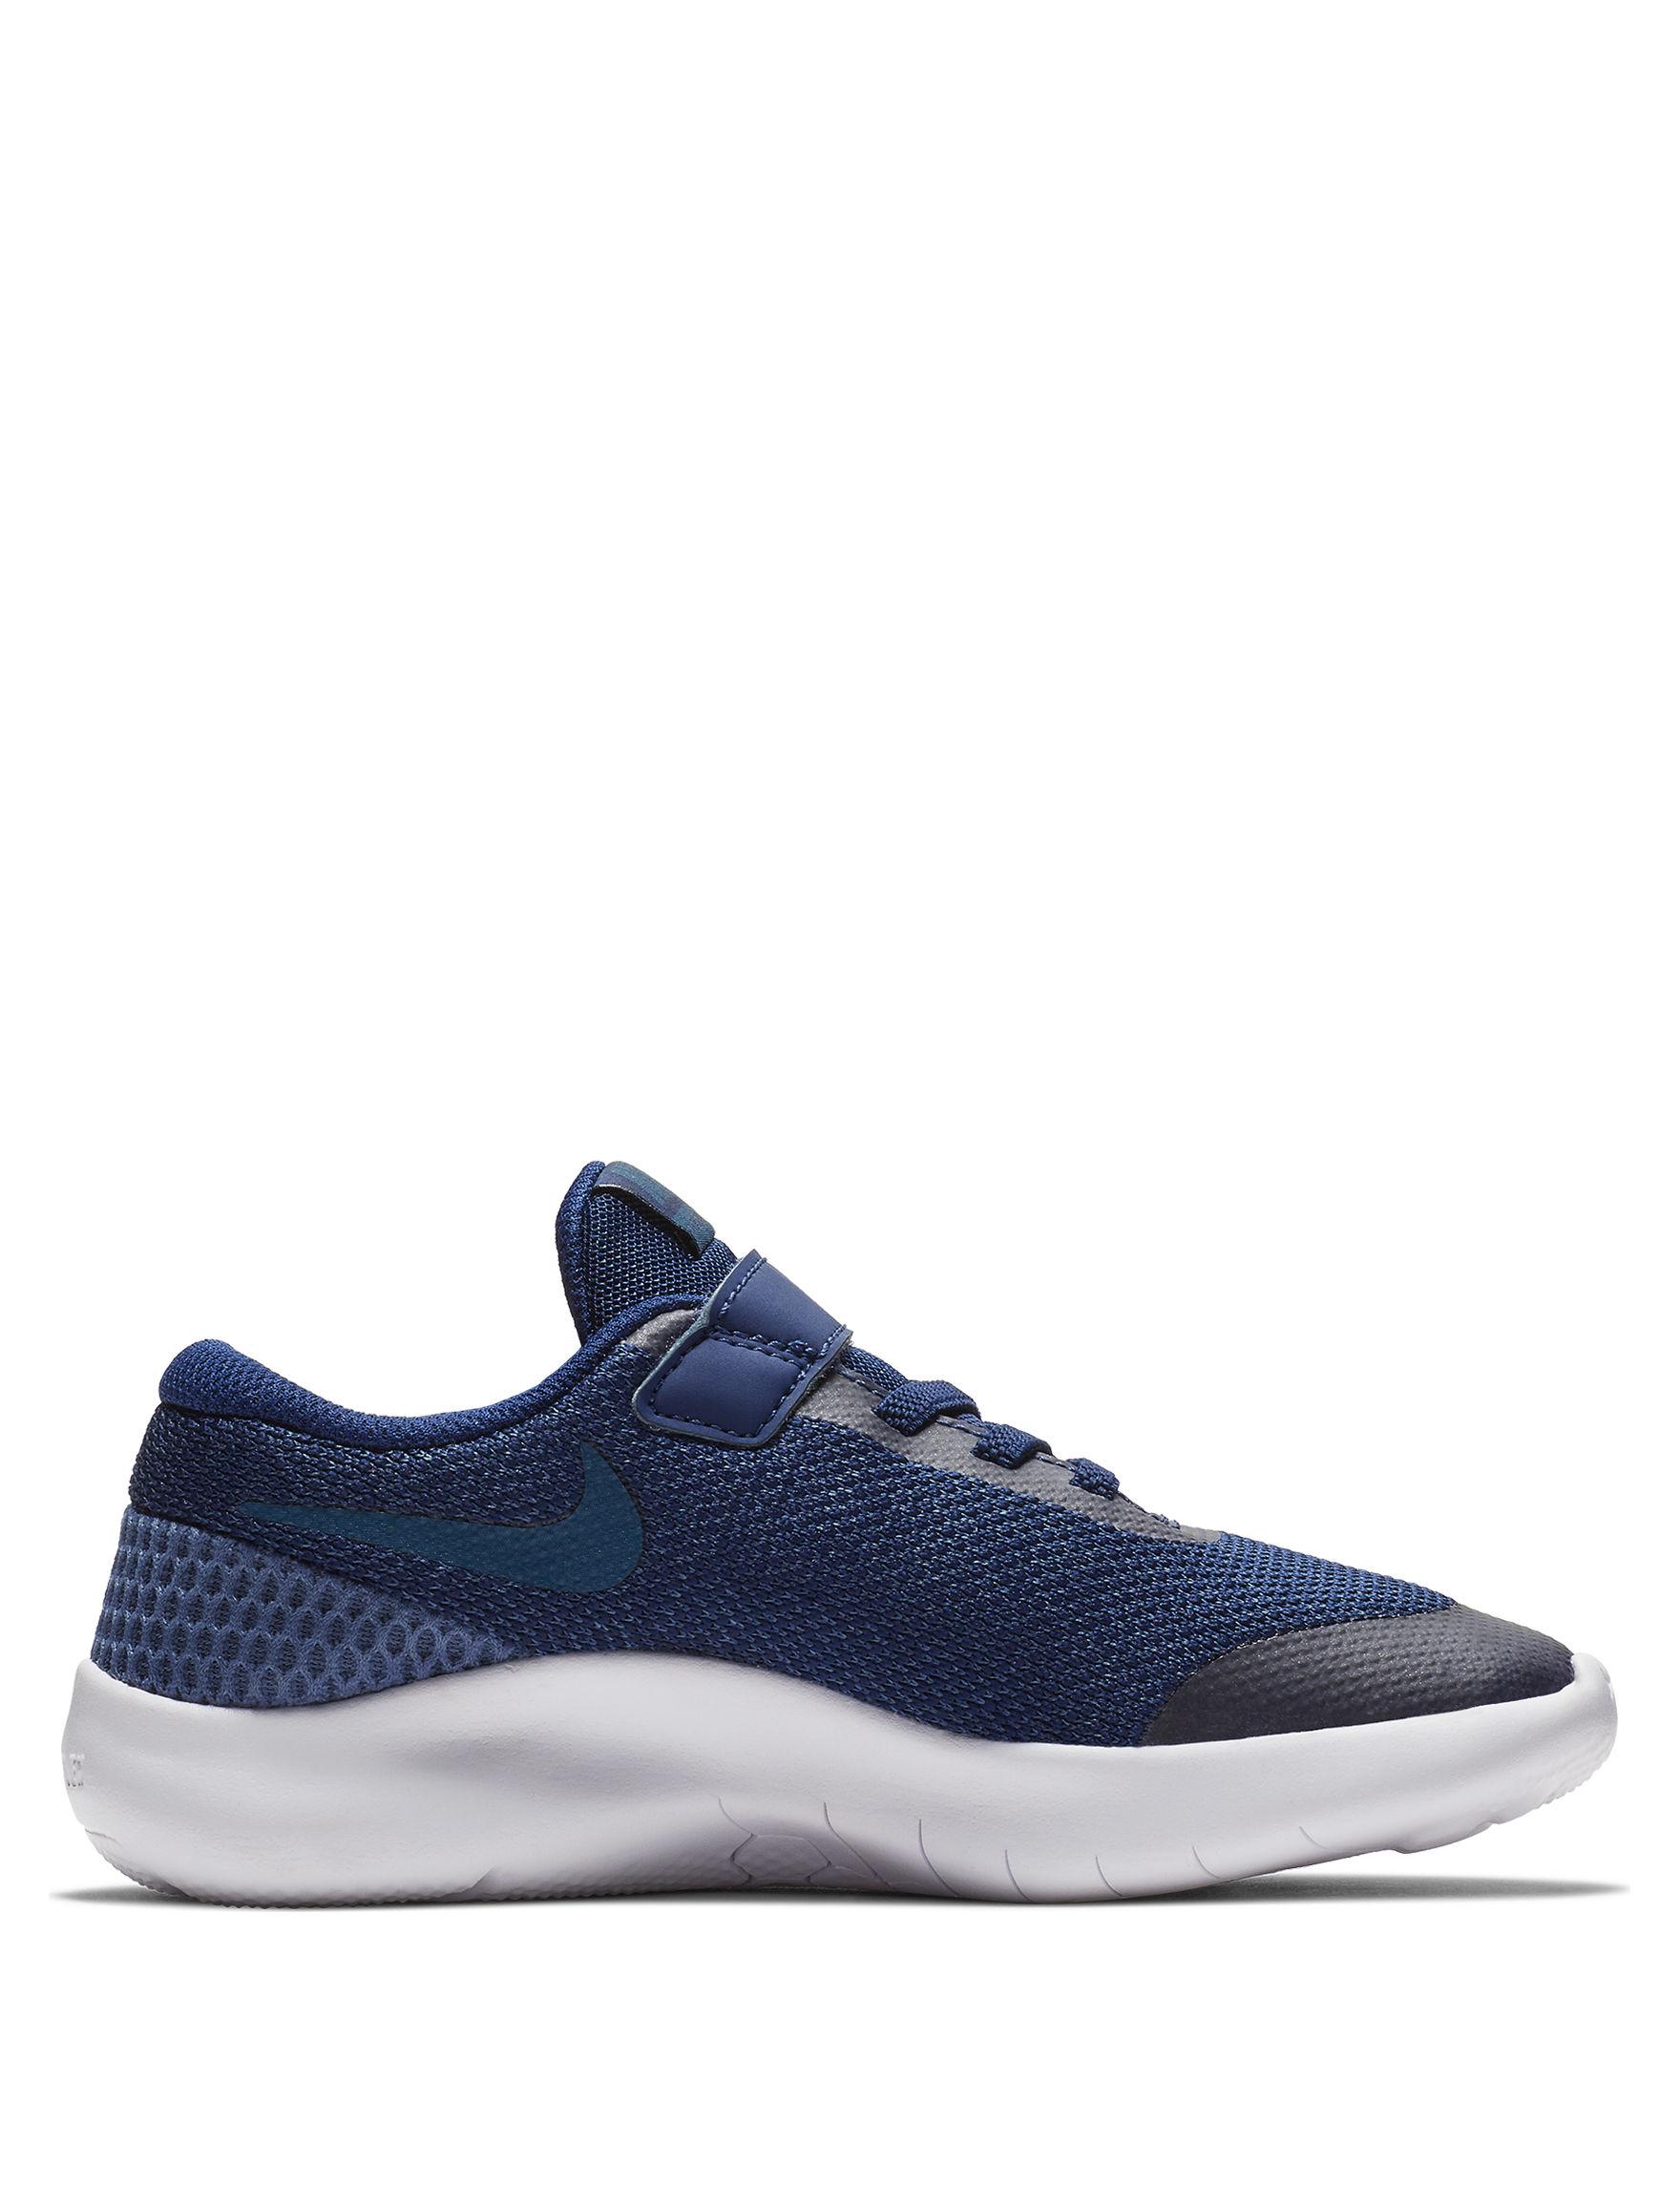 Nike Flex Experience Run 7 Running Shoes - Boys 11-3 - Navy - 3 a41ee72c7